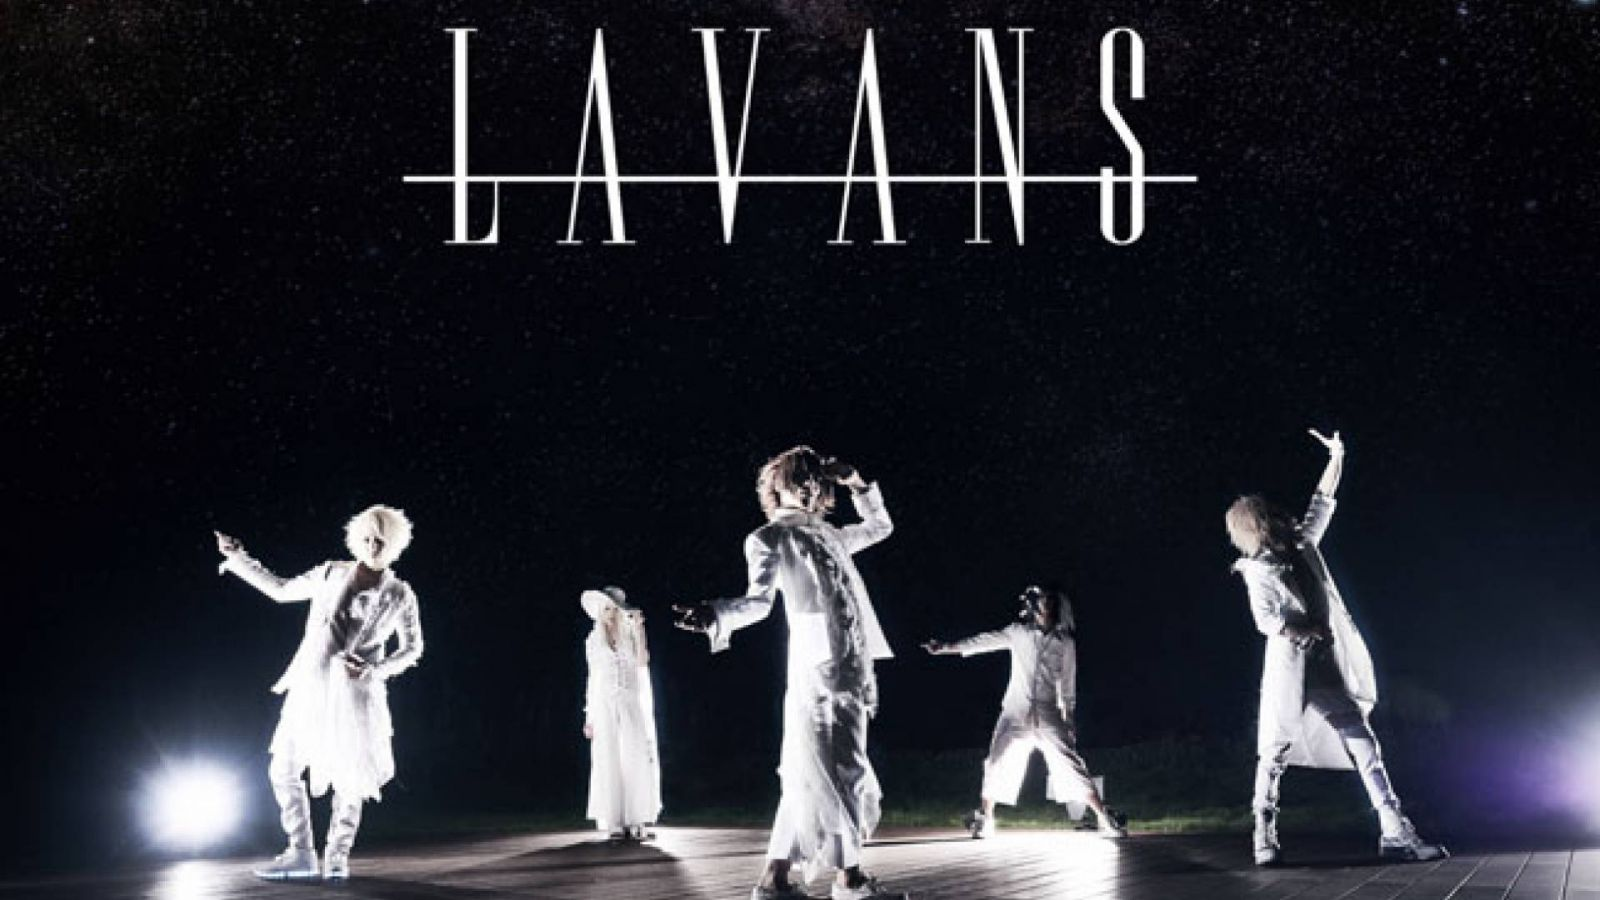 LAVANS © 2018 LAVANS, provided by Gan-Shin Records